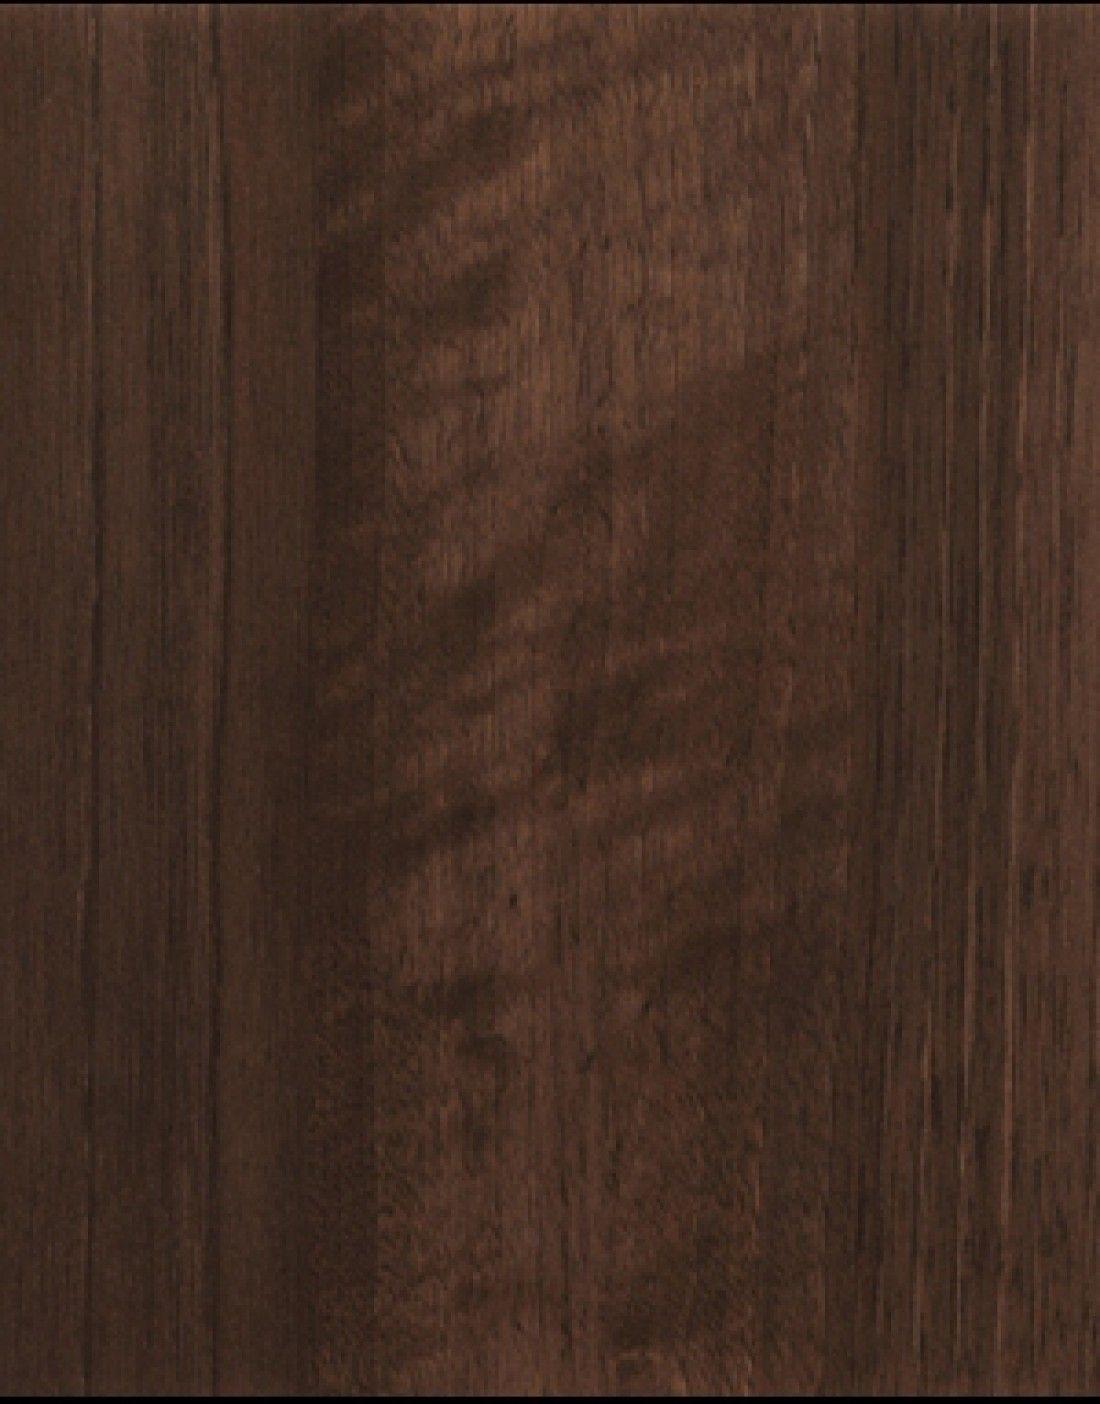 cabinet stain mink - Google Search   kitchens   Pinterest